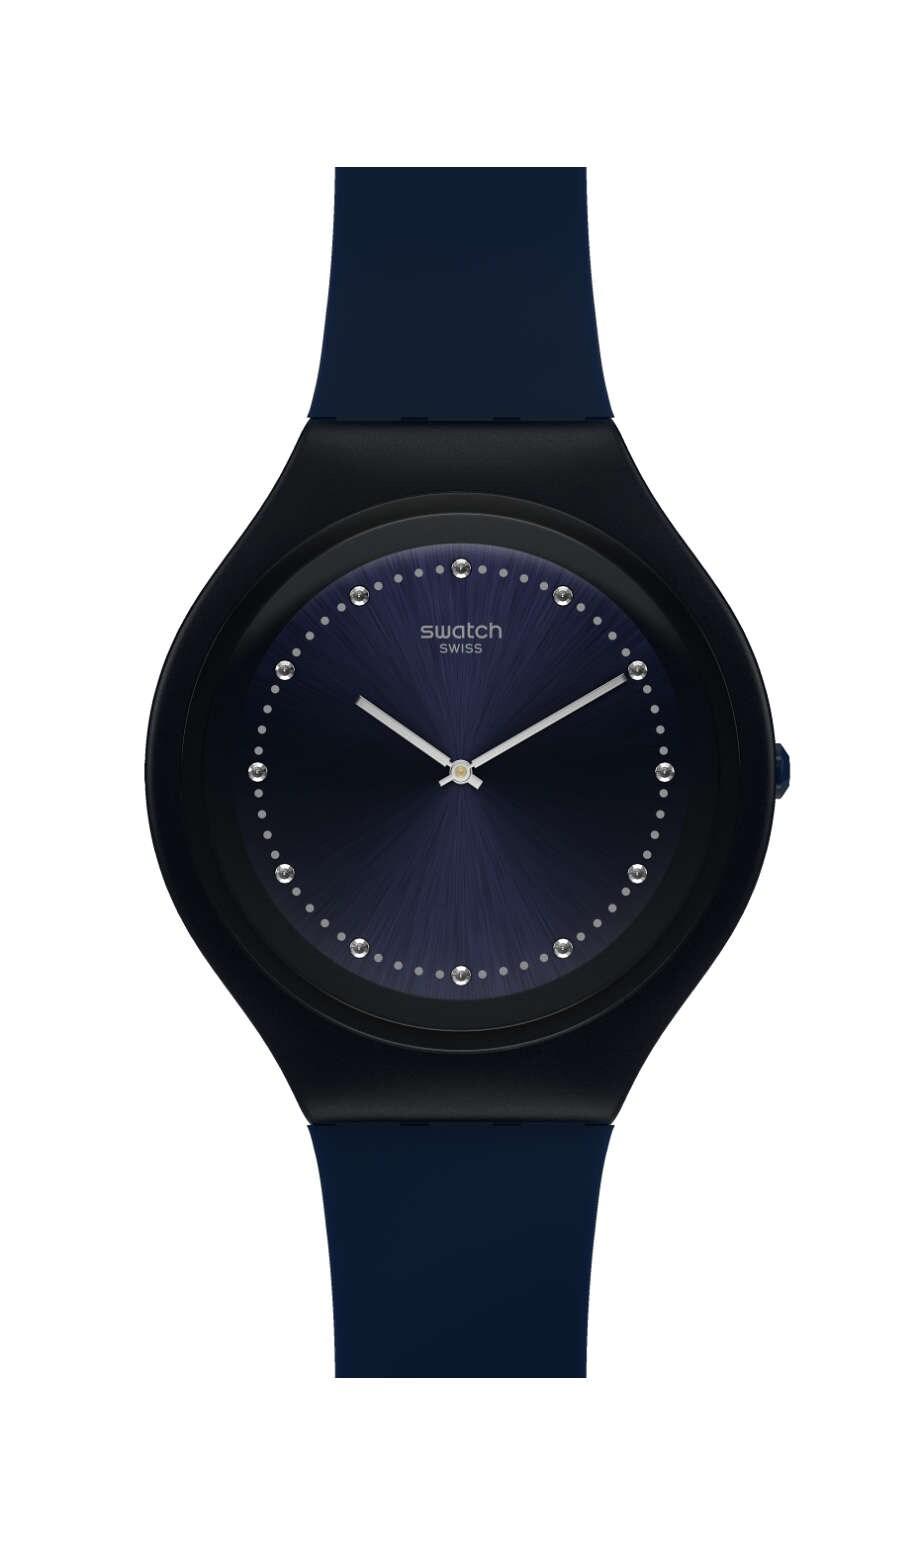 Swatch - SKINSPARKS - 1